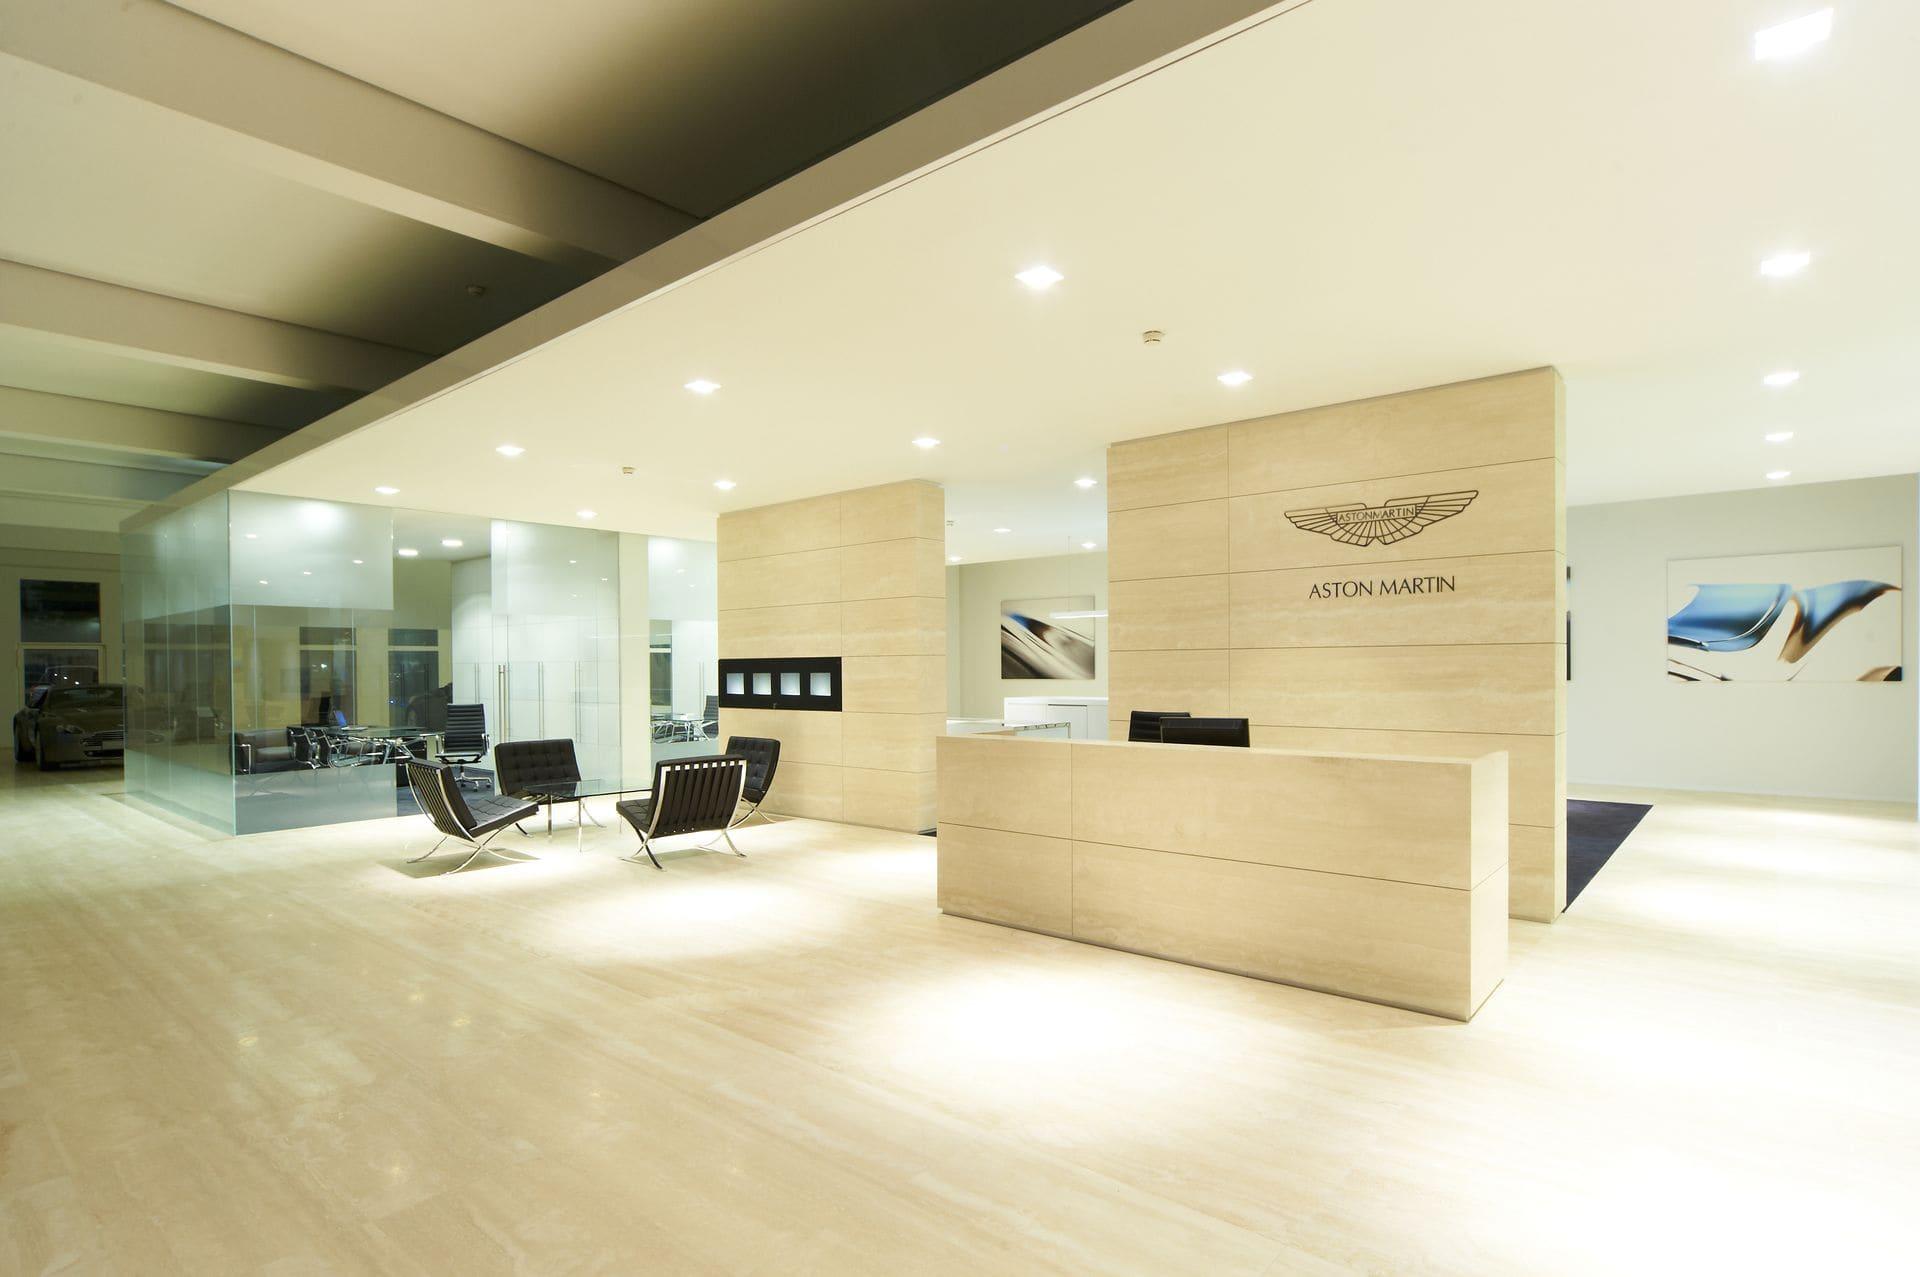 Aston Martin 38 s2500 - Aston Martin Wien Showroom